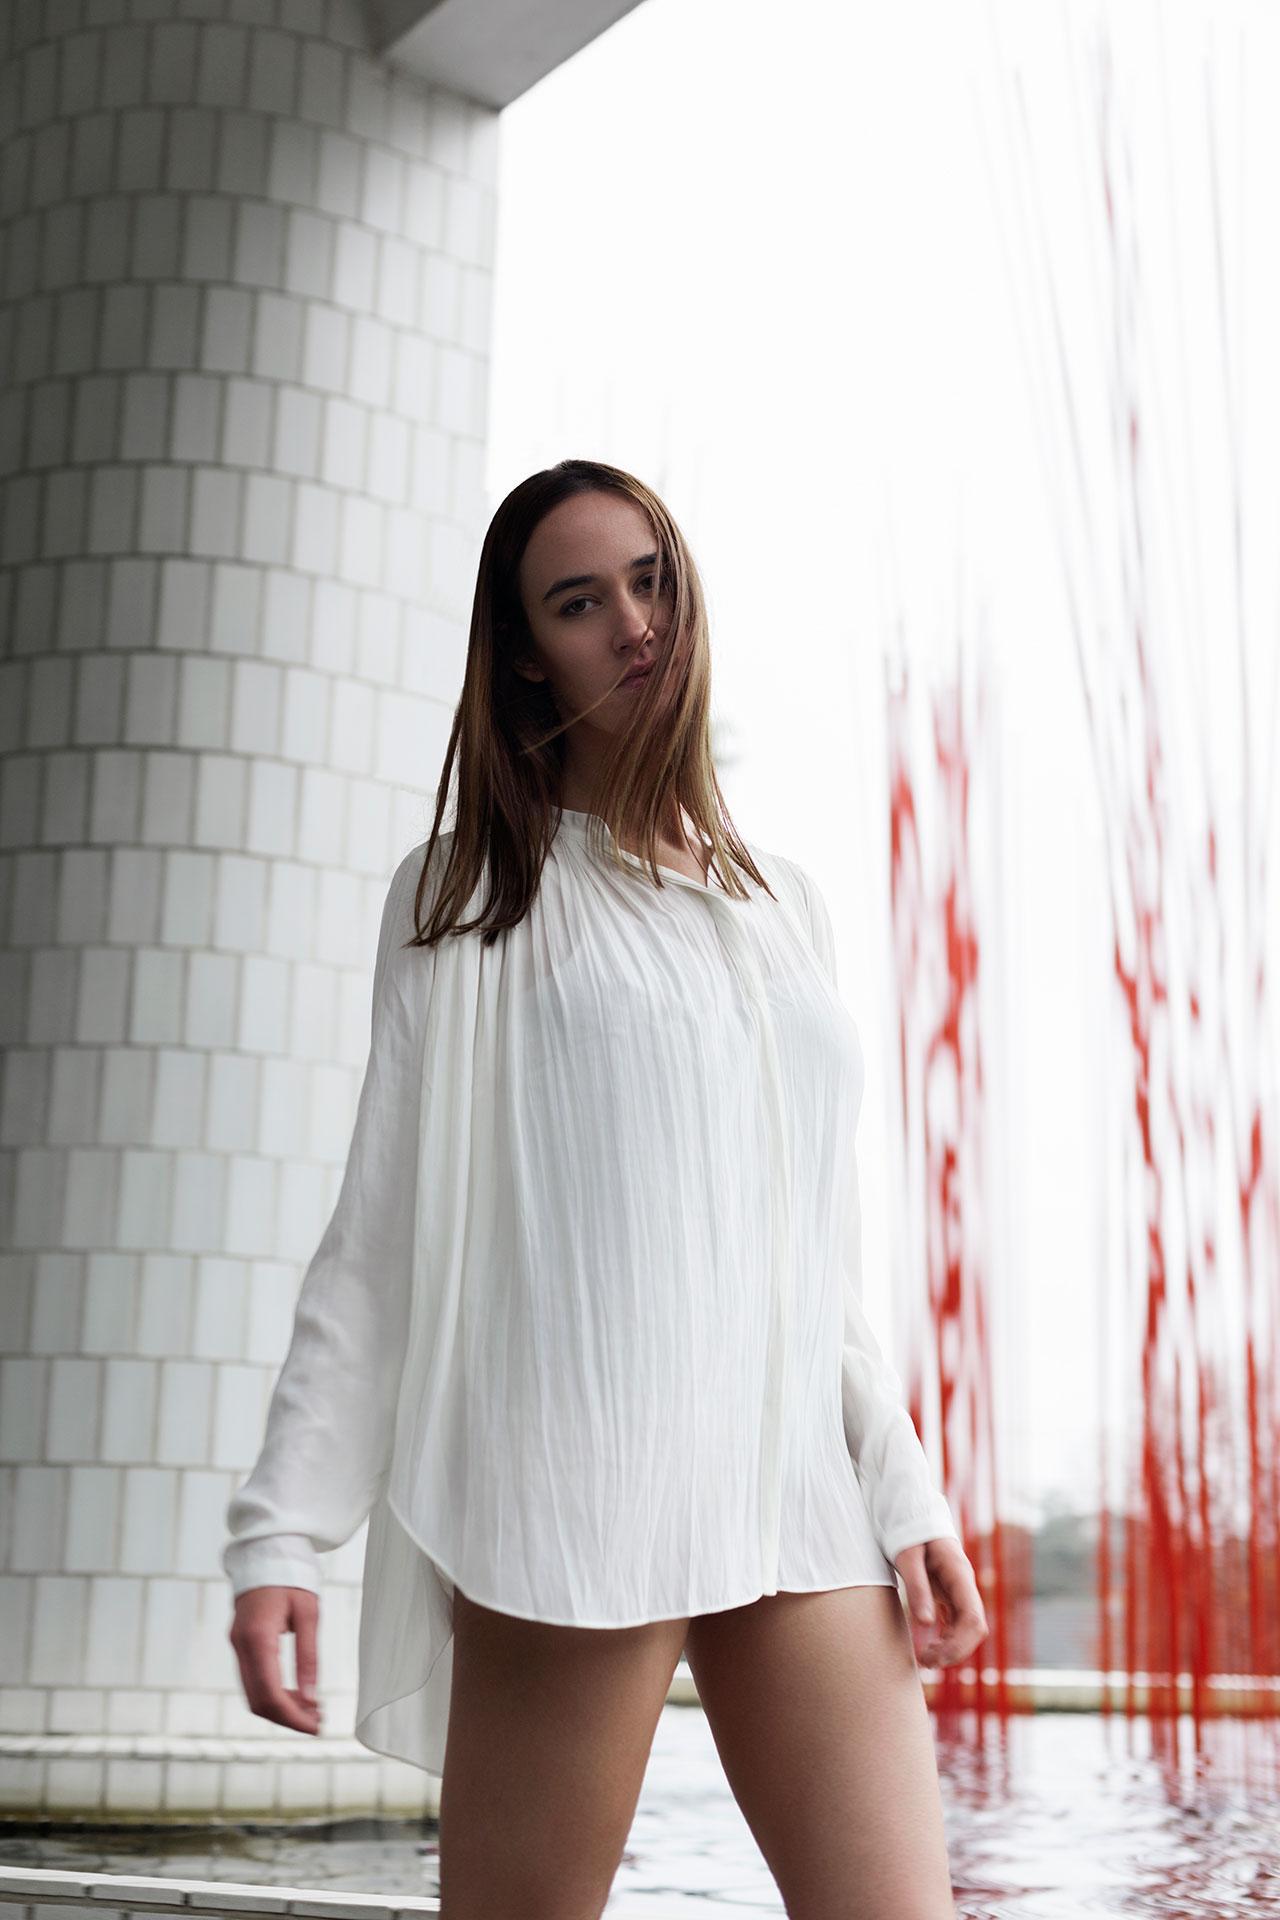 Maja Mircic - WINK Models Australia